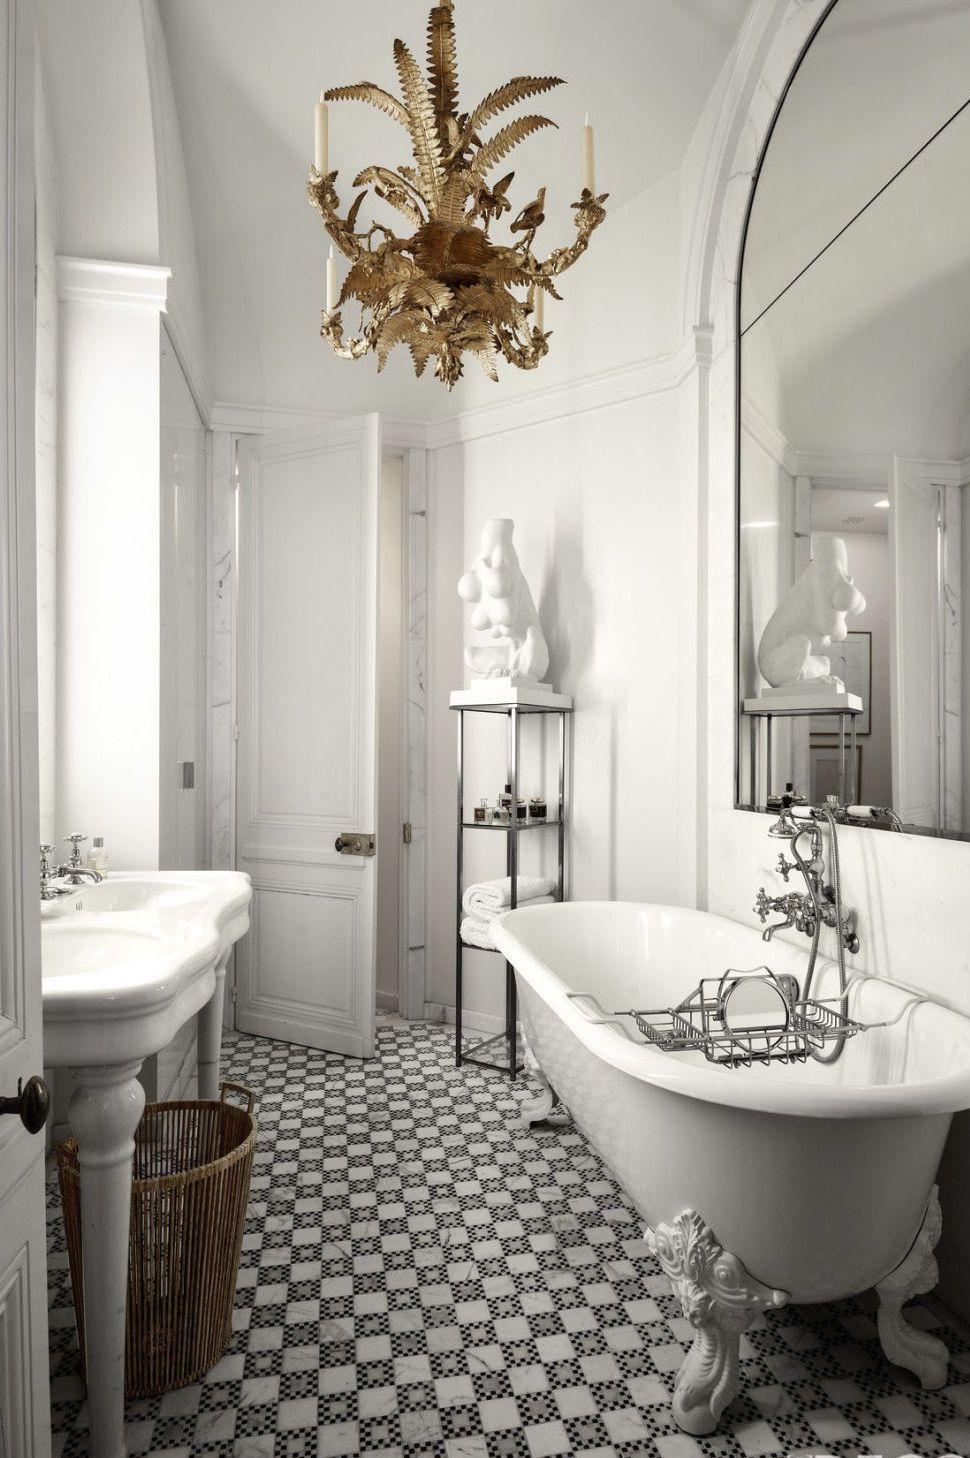 25 Best Modern Bathrooms - Luxe Bathroom Ideas with Modern Design